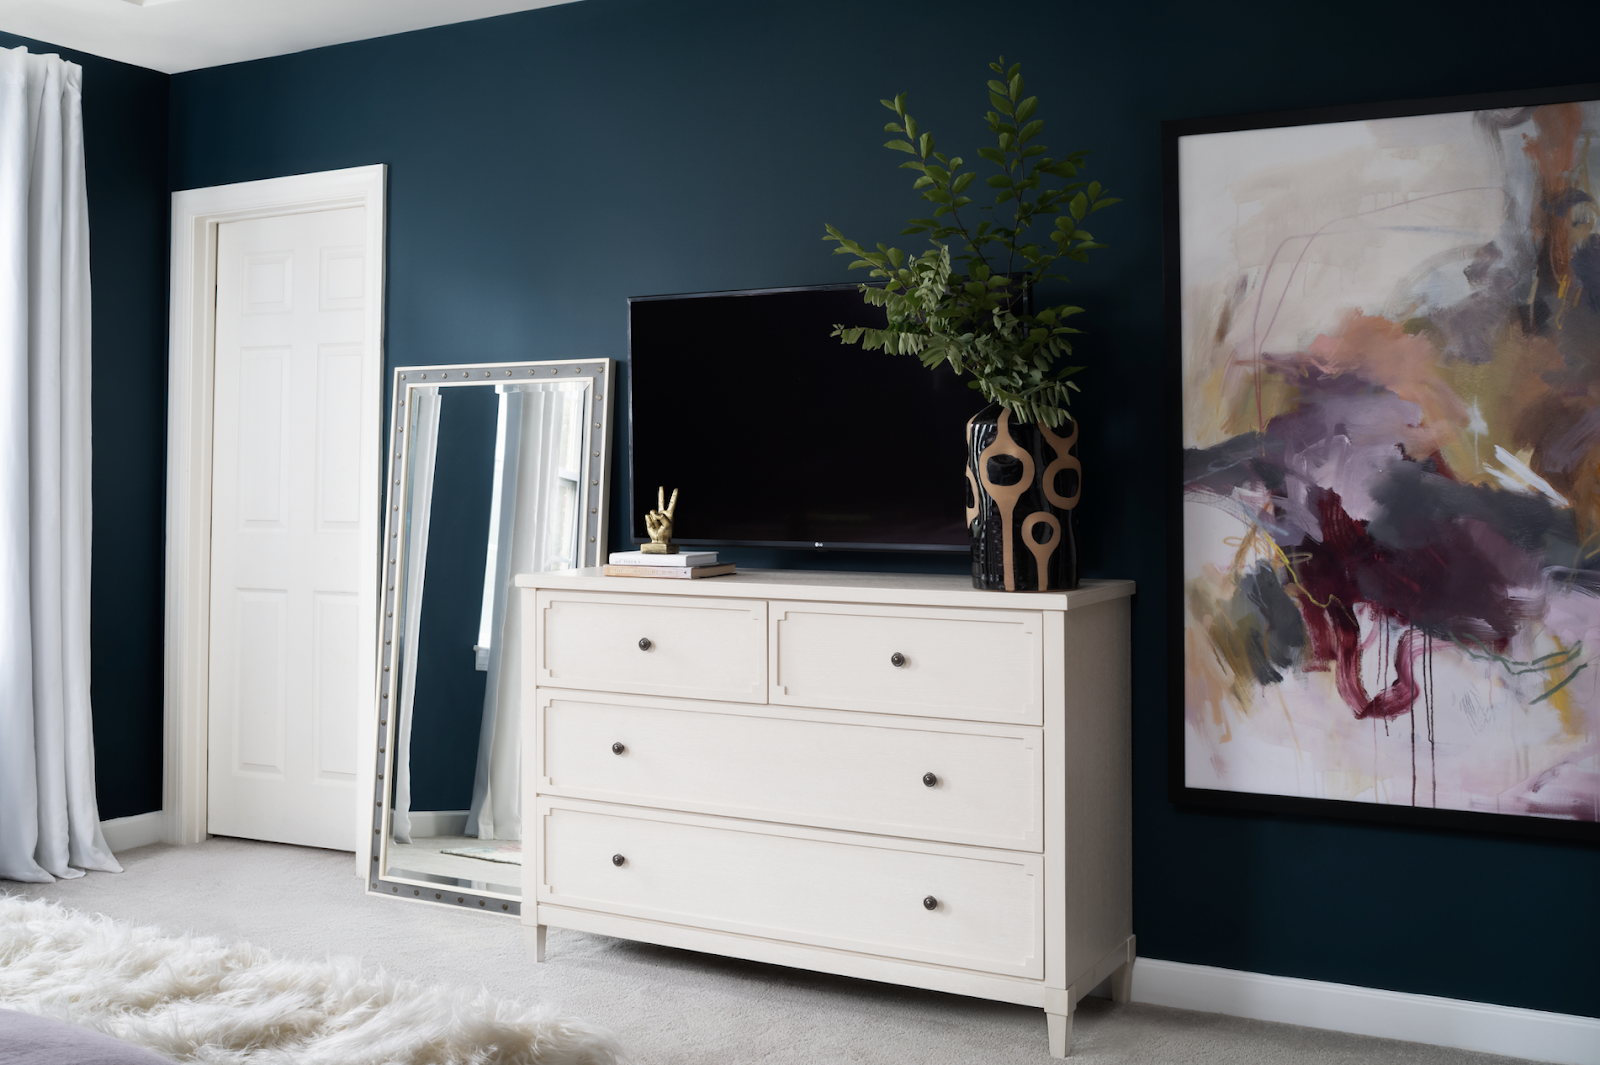 bedroom joyful restful design abstract art teal walls white dresser mirror joy street initiative